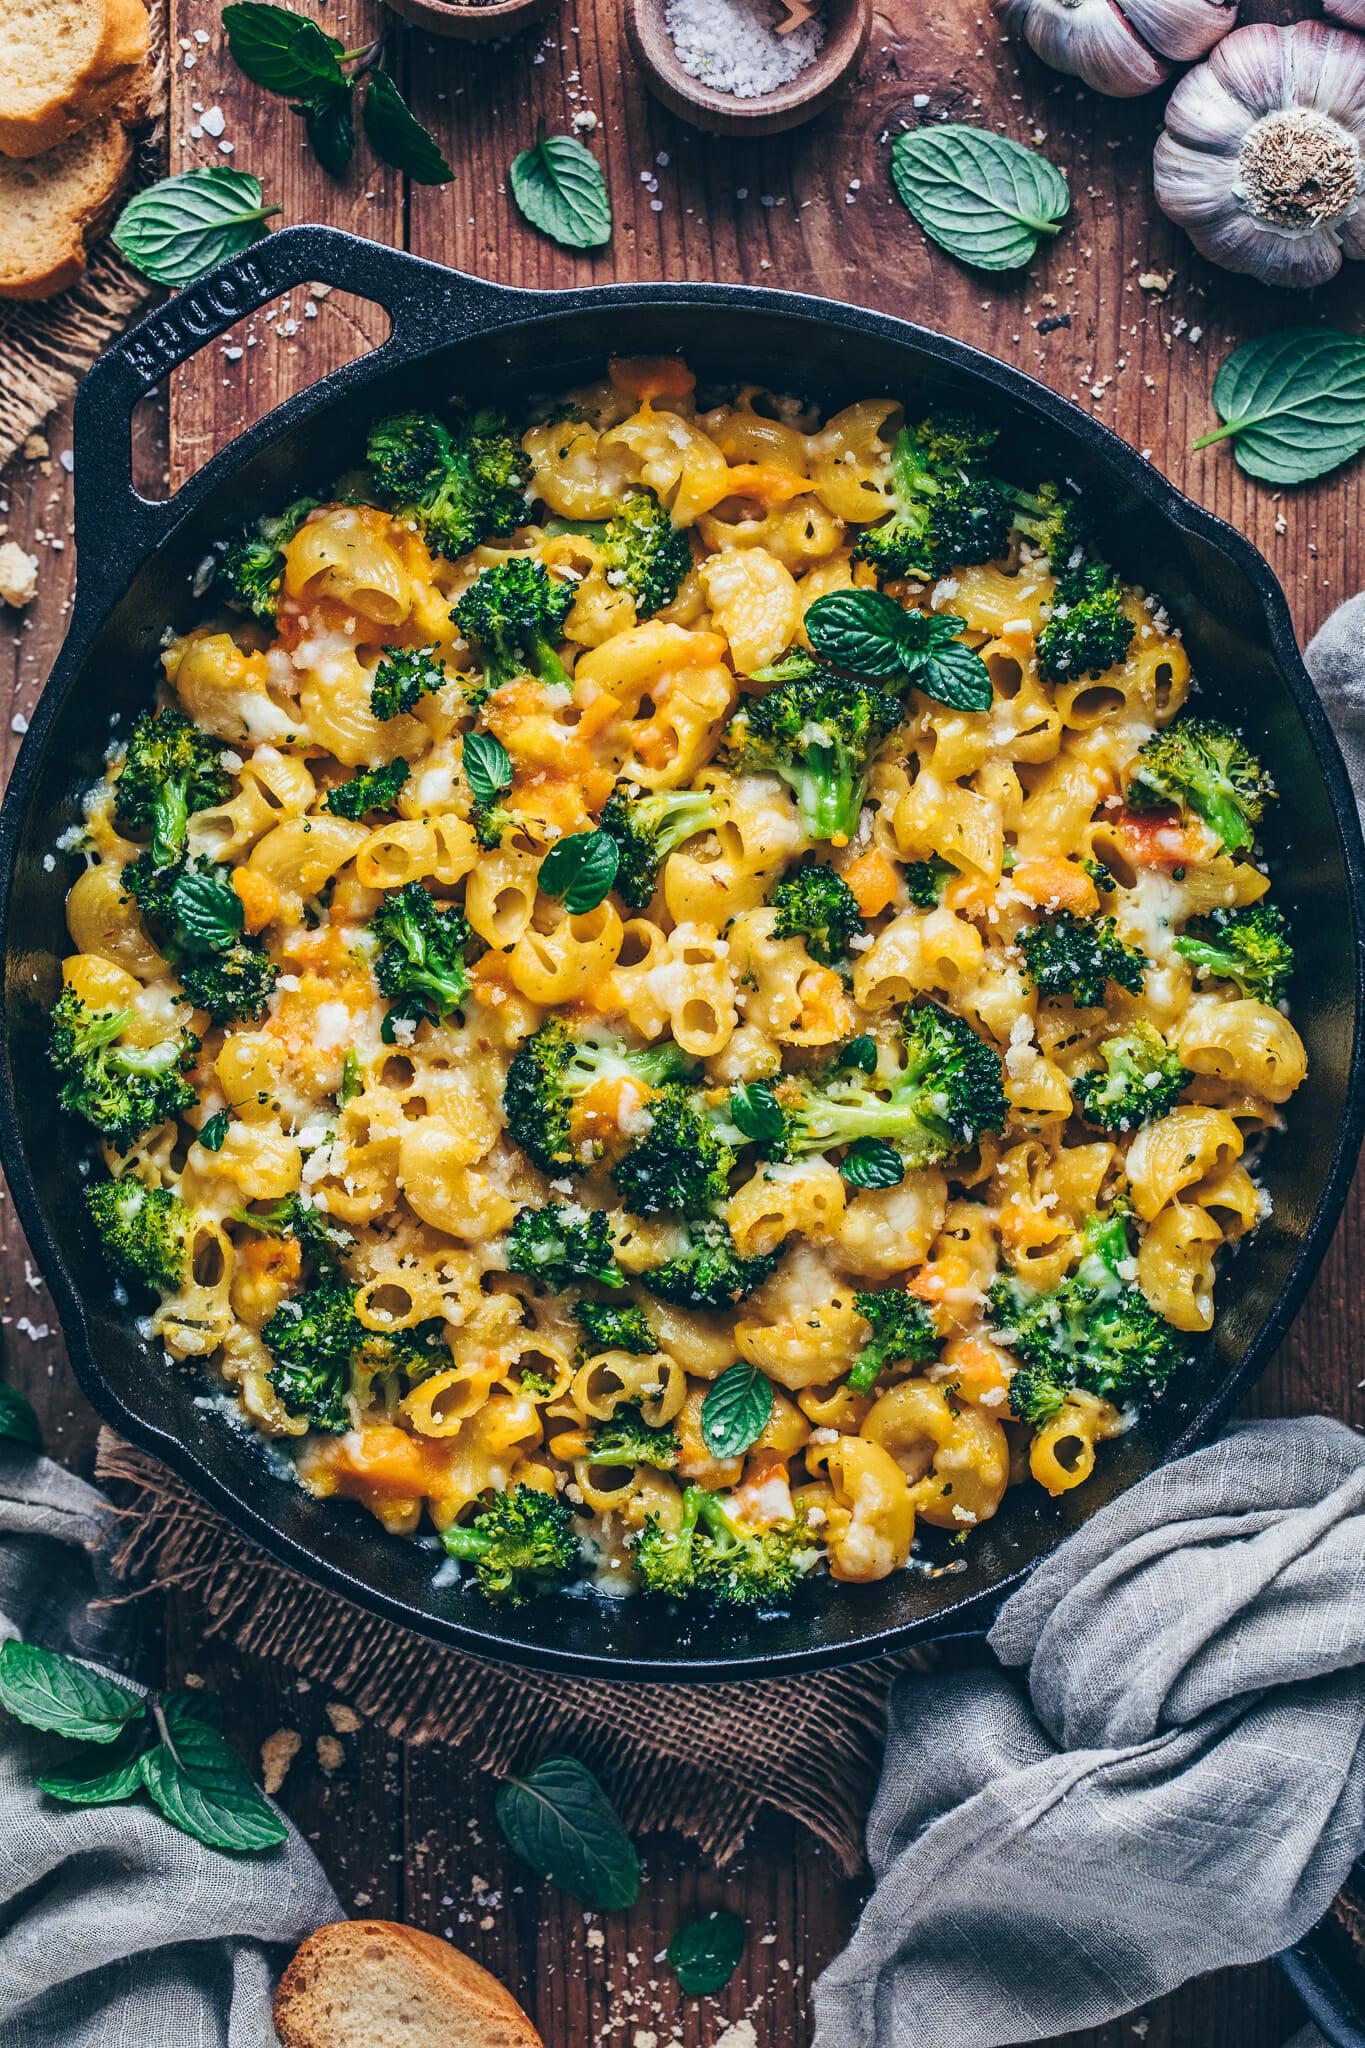 Broccoli Mac and Cheese Casserole